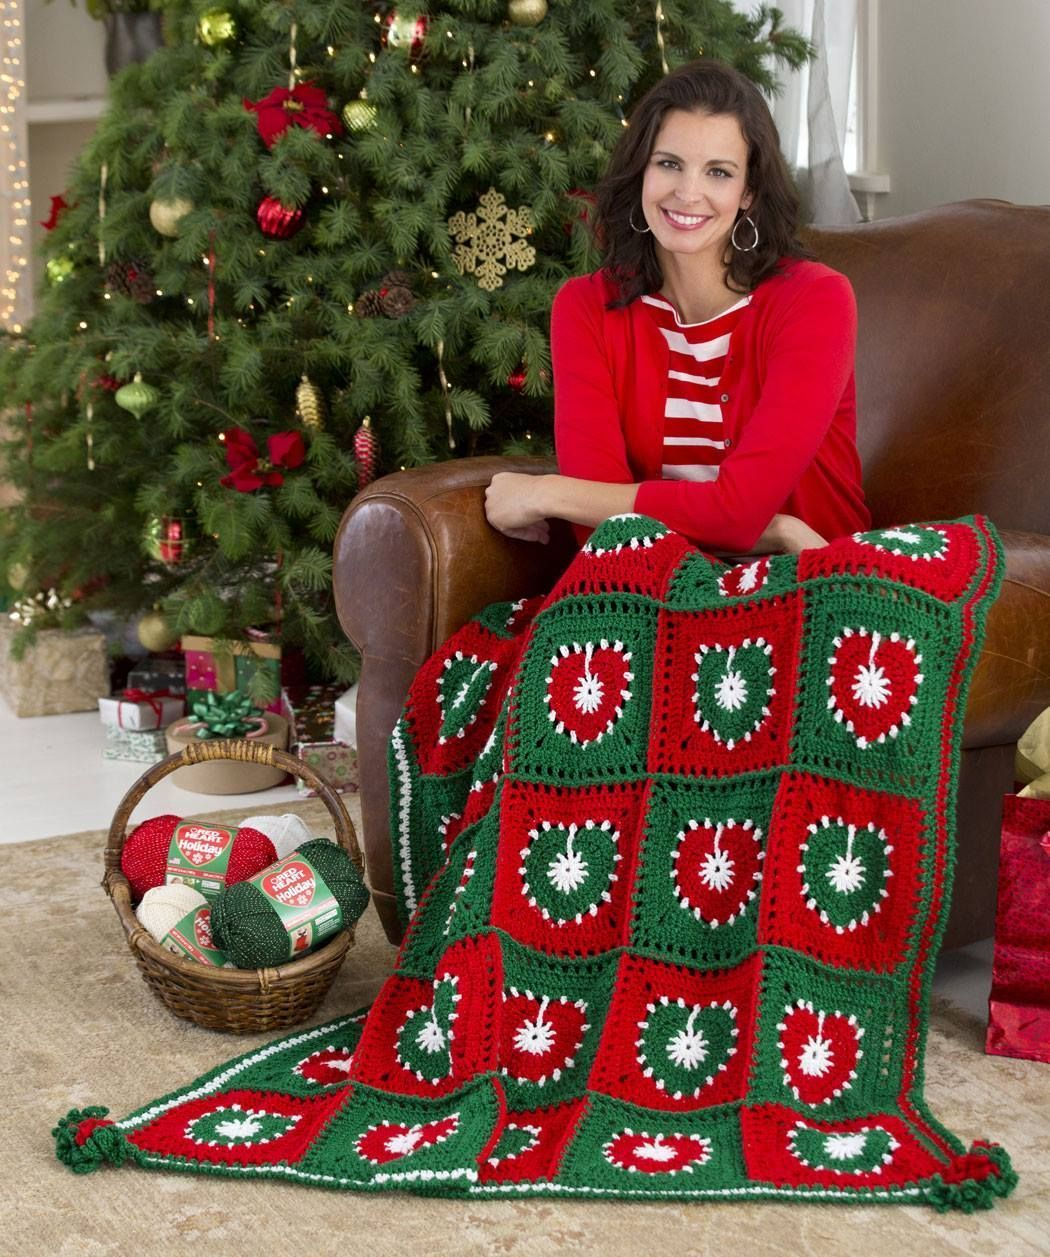 Christmas Tree Square Christmas Crochet Crochet Xmas Christmas Crochet Patterns